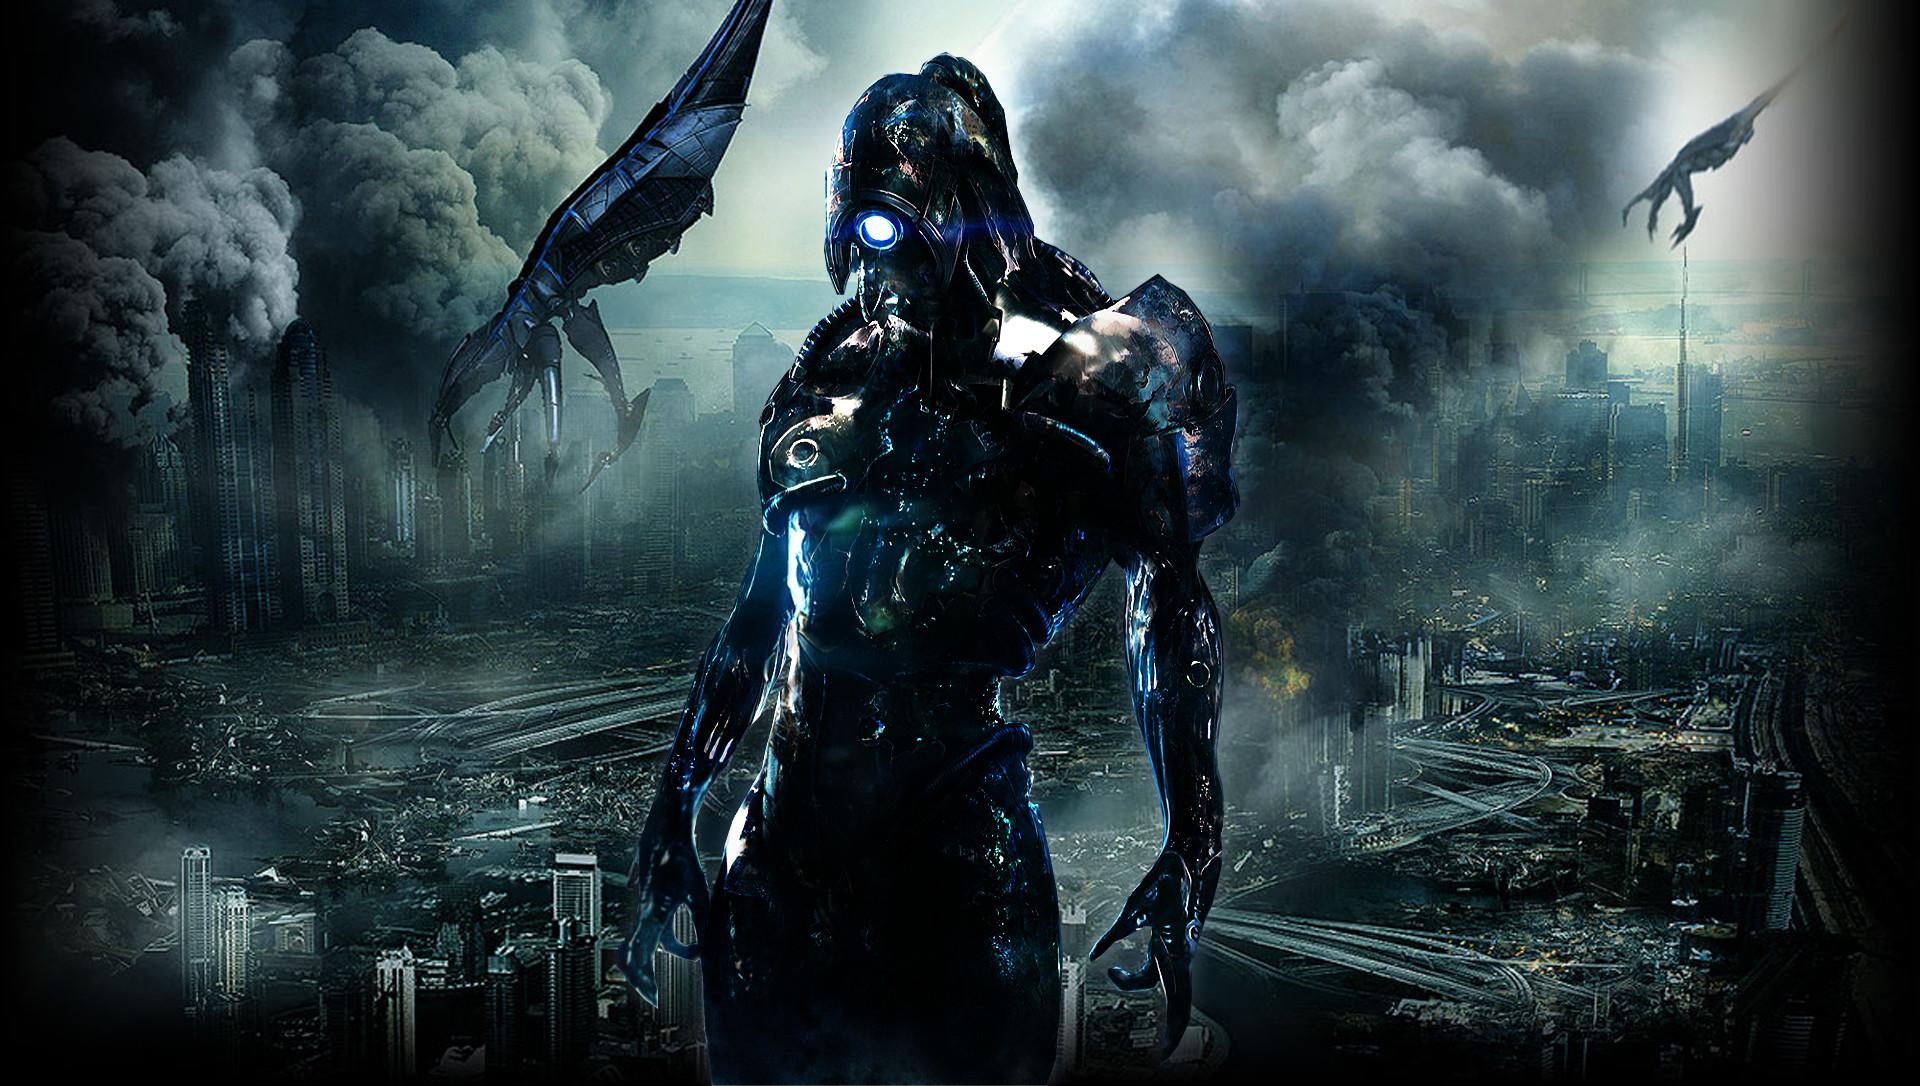 Legion, Mass Effect, Apocalyptic, Reapers, Destruction